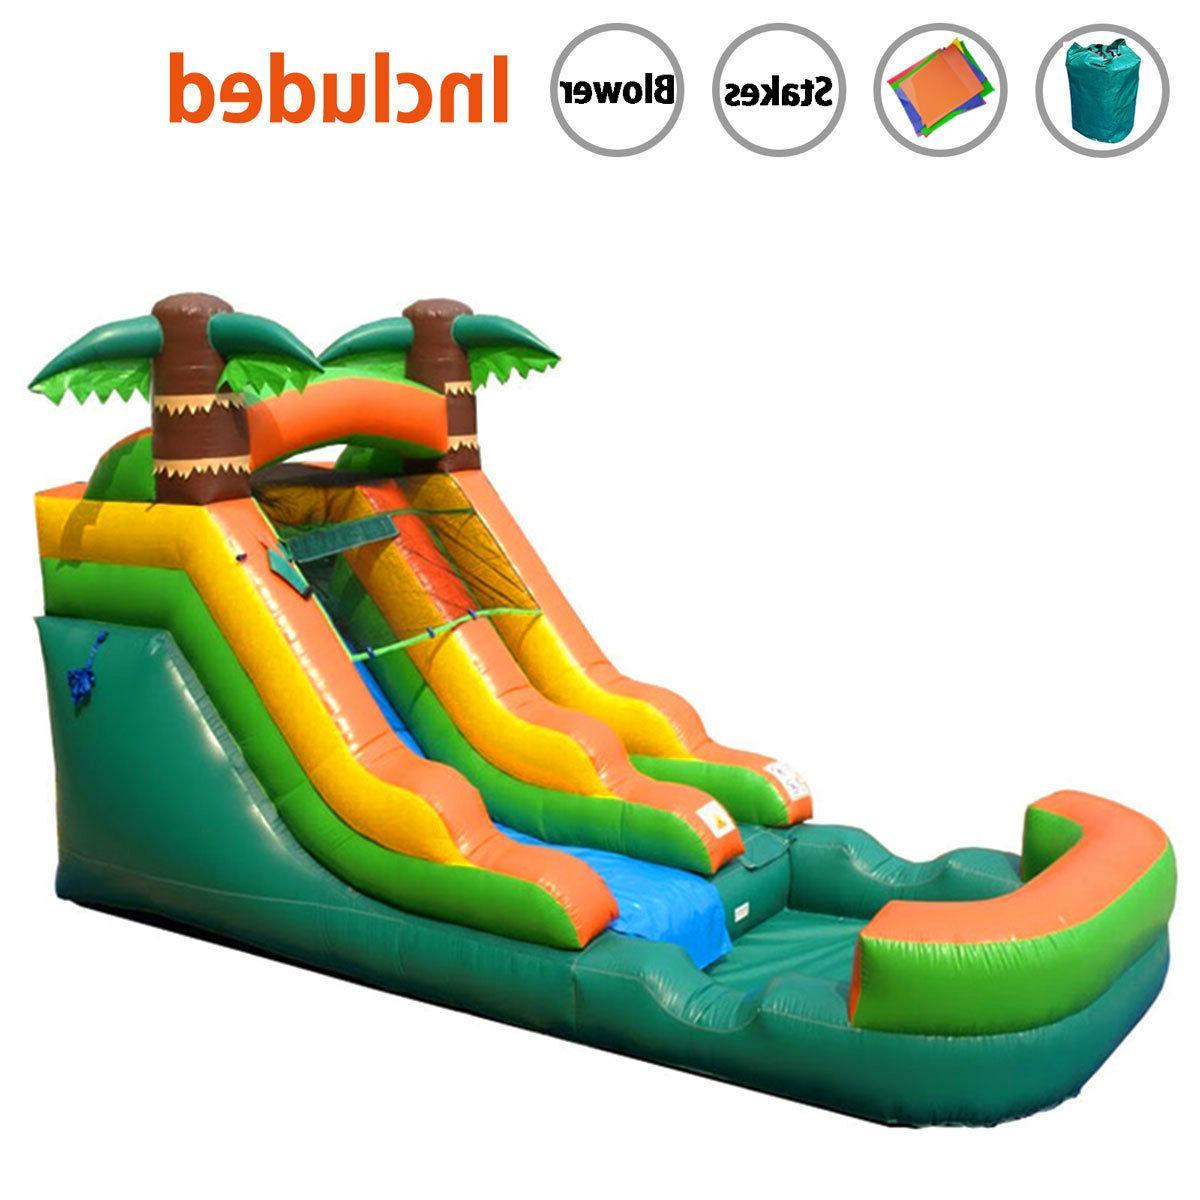 12' Tropical Inflatable Water Splash